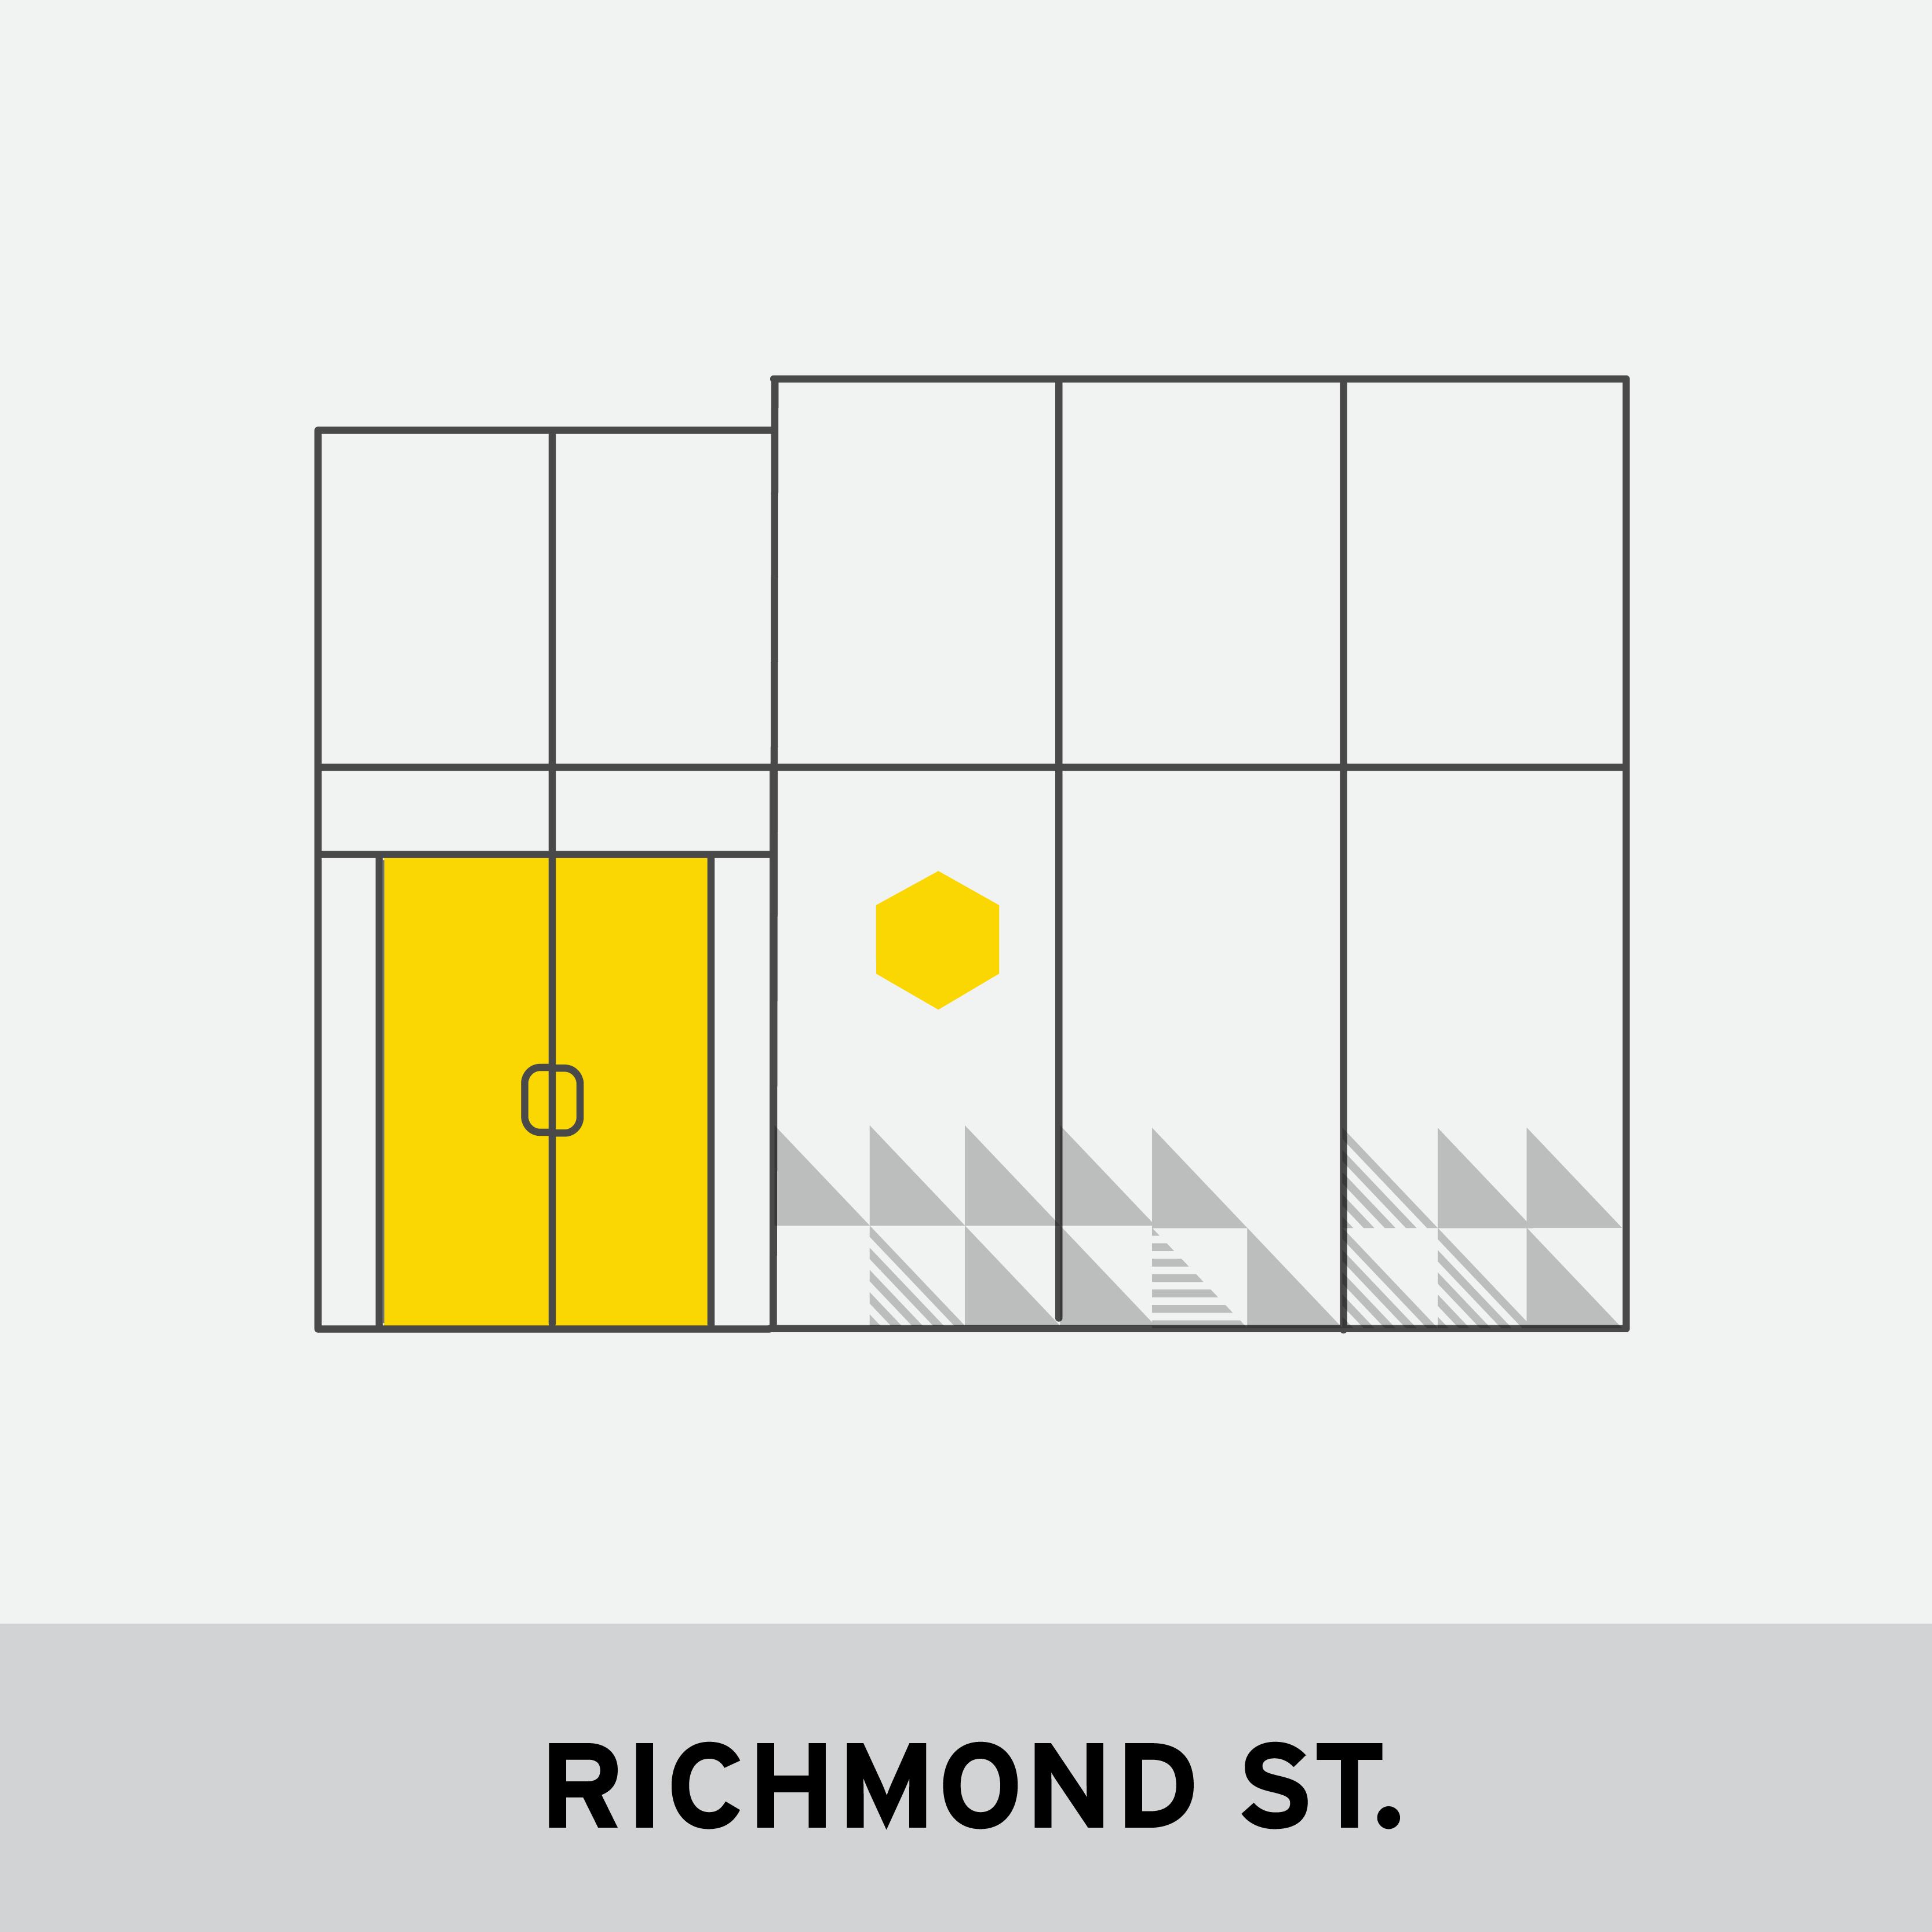 RICHMOND ST.